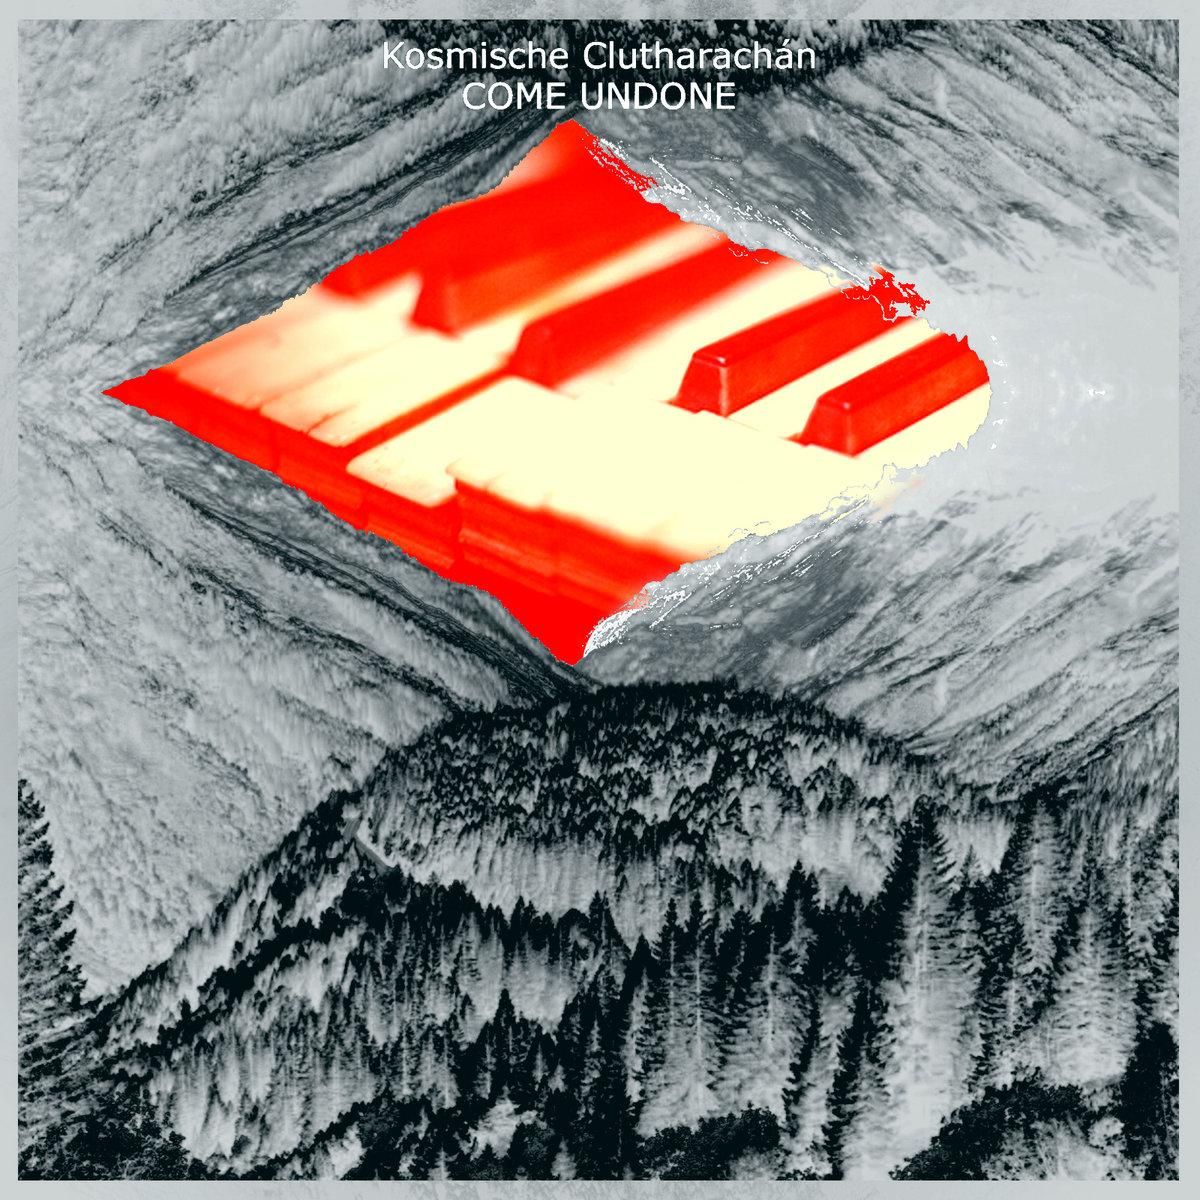 Kosmische Clutharachán – Come Undone (Duran Duran Cover)